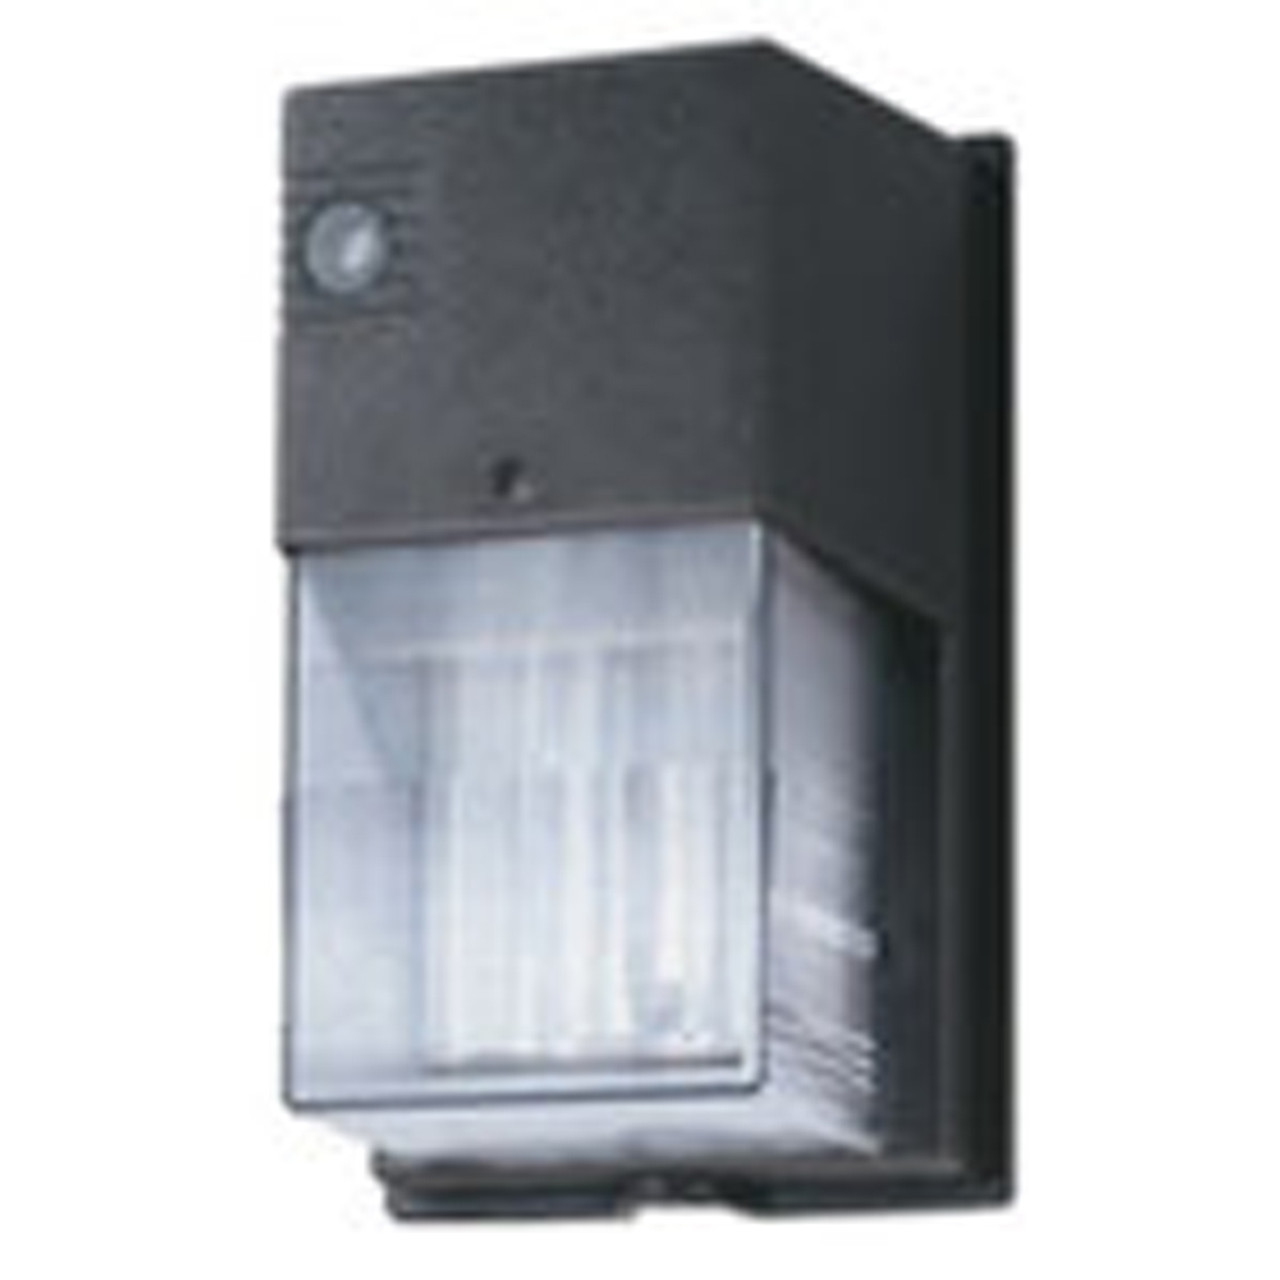 LITHONIA LIGHTING TWP 150S TB LPI Wall Pack,150W,120-277V